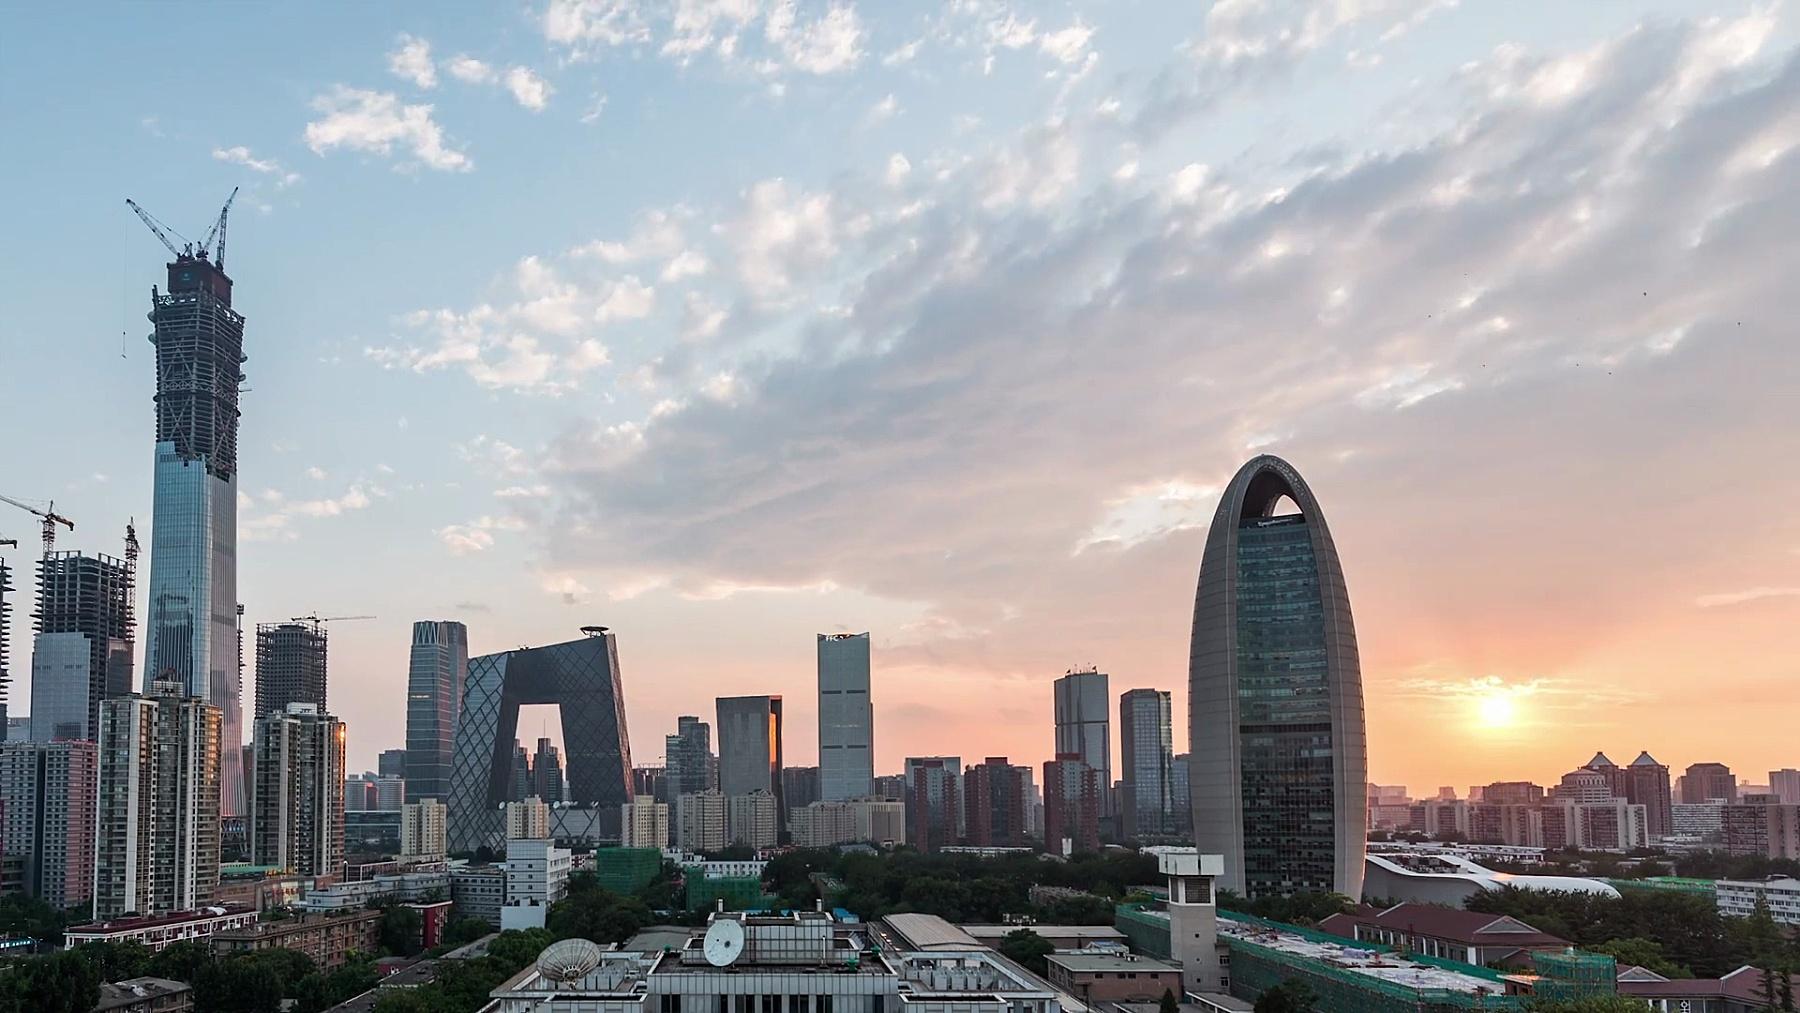 T/L WS PAN摩天大楼天际线全景屋顶/中国北京